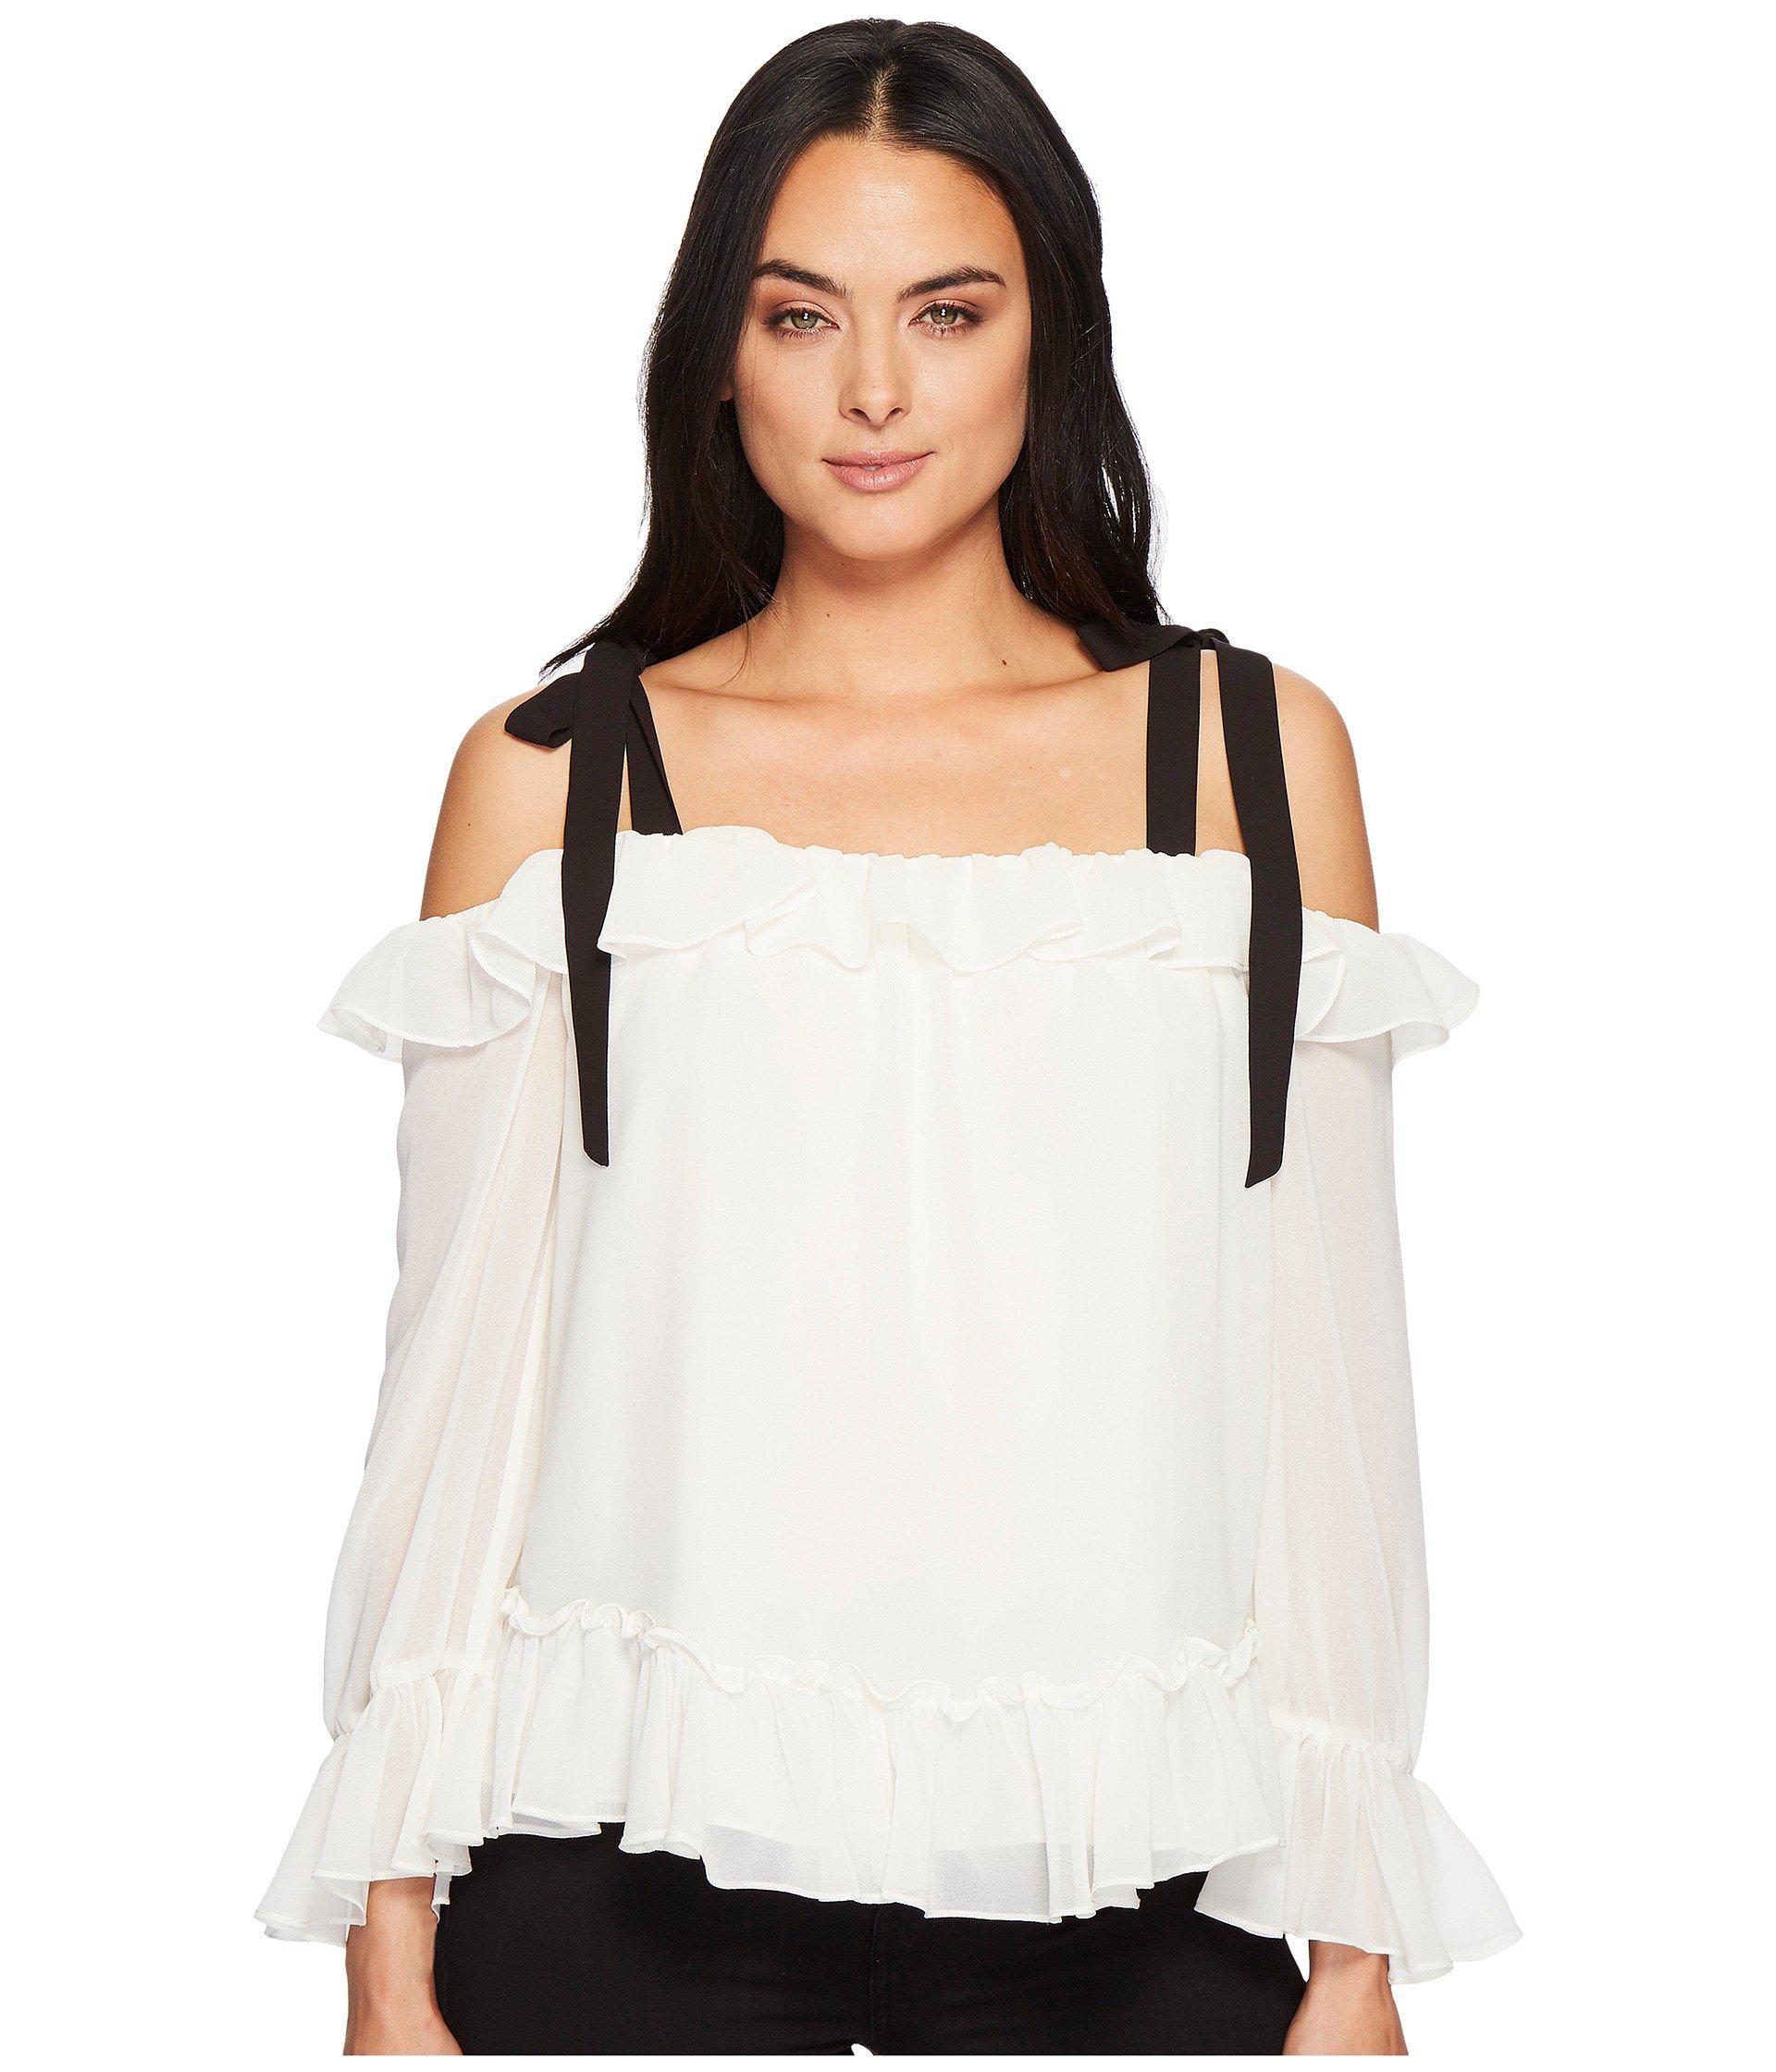 b972464db63fd1 Lyst - Cece Long Sleeve Ruffled Blouse W  Shoulder Ties in White